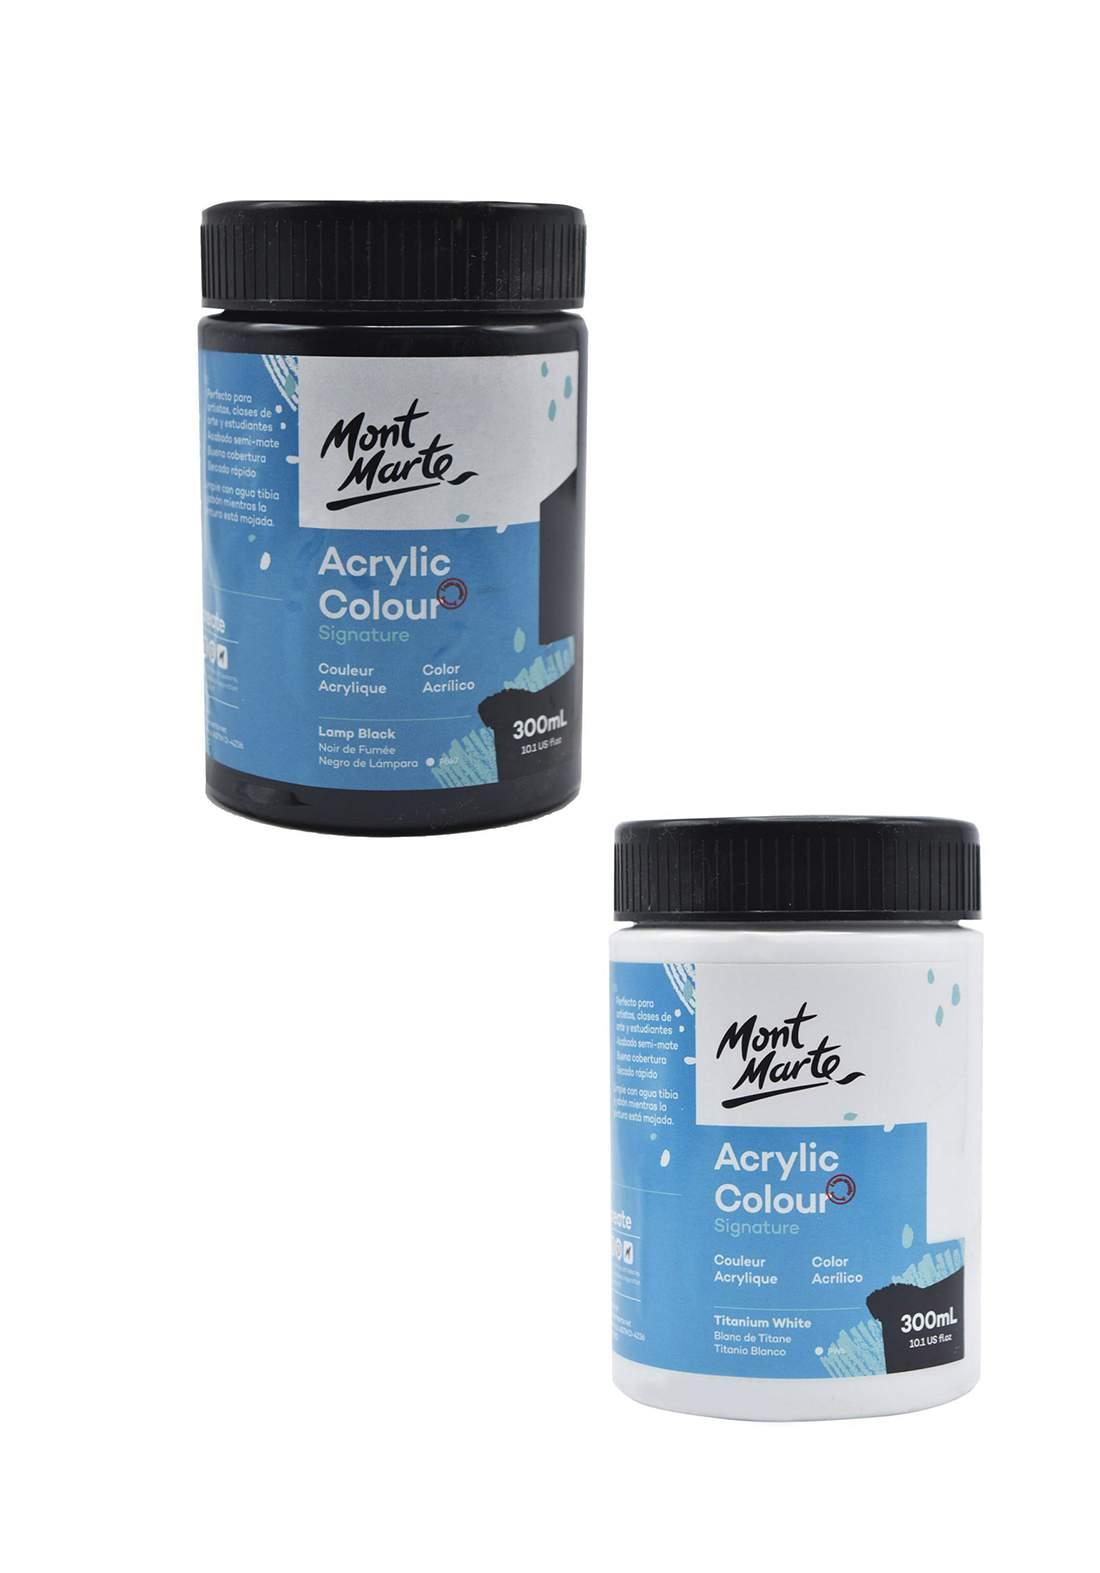 Mont Marte Signature Acrylic Colour 300ml علبة أكريليك